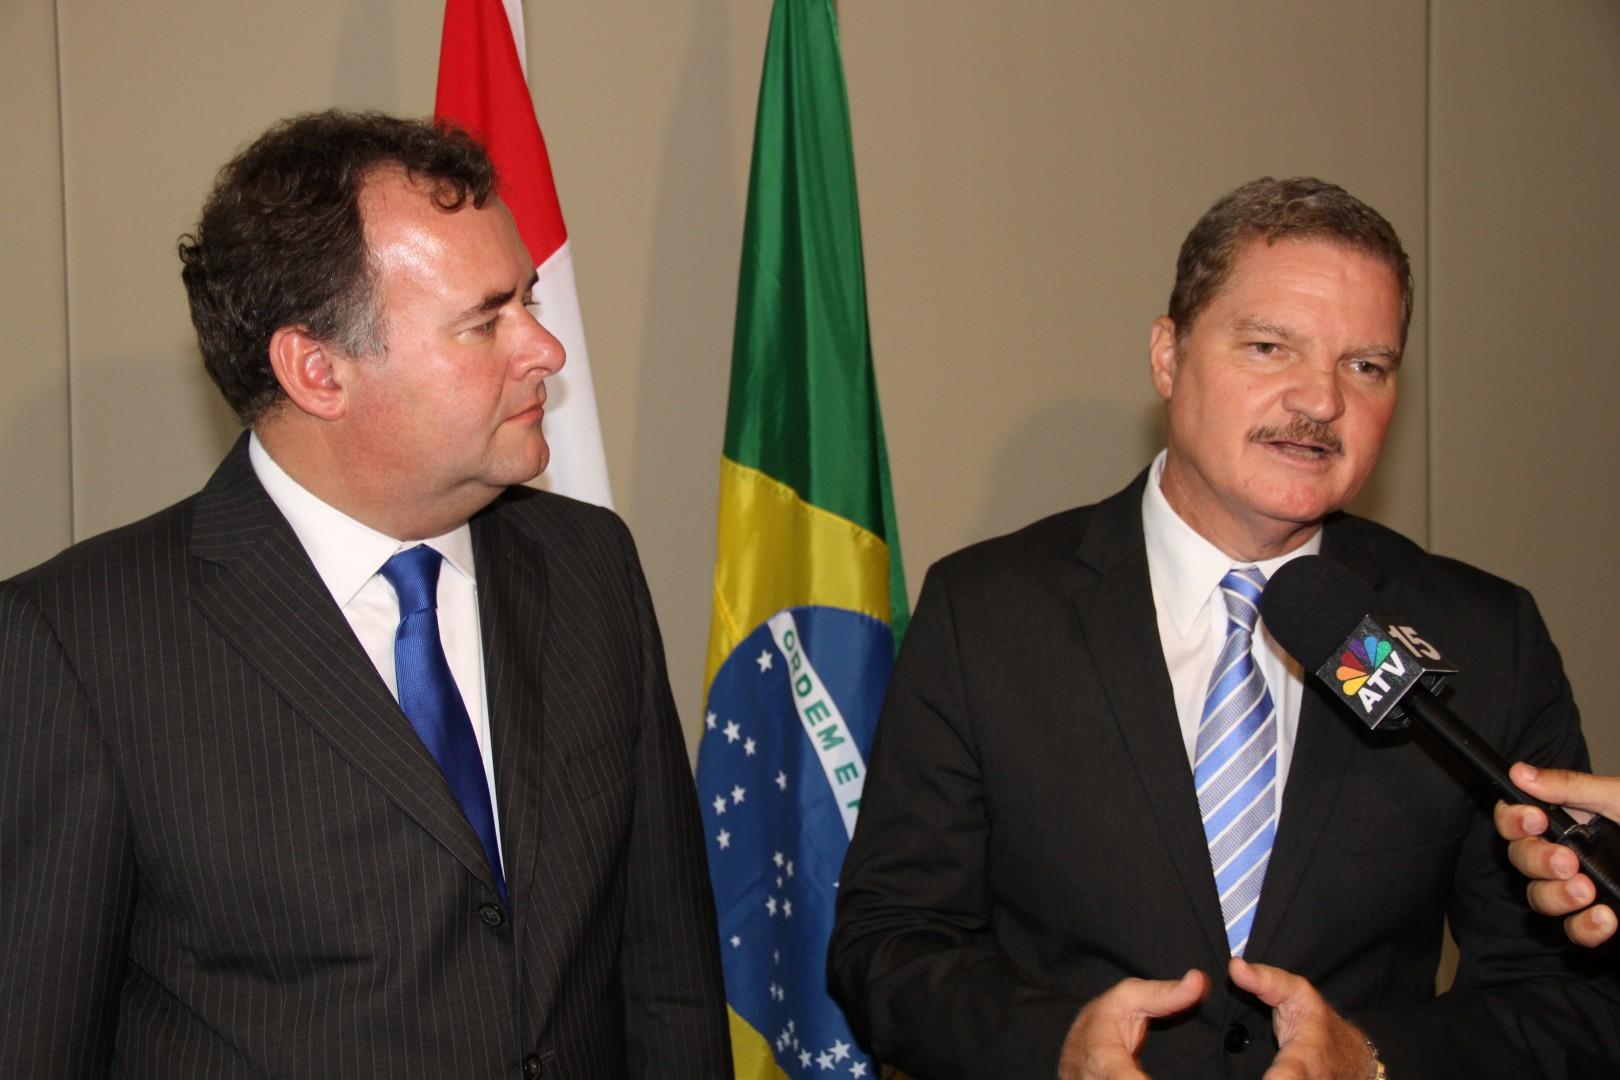 Hans Biesheuvel and Mike Eman